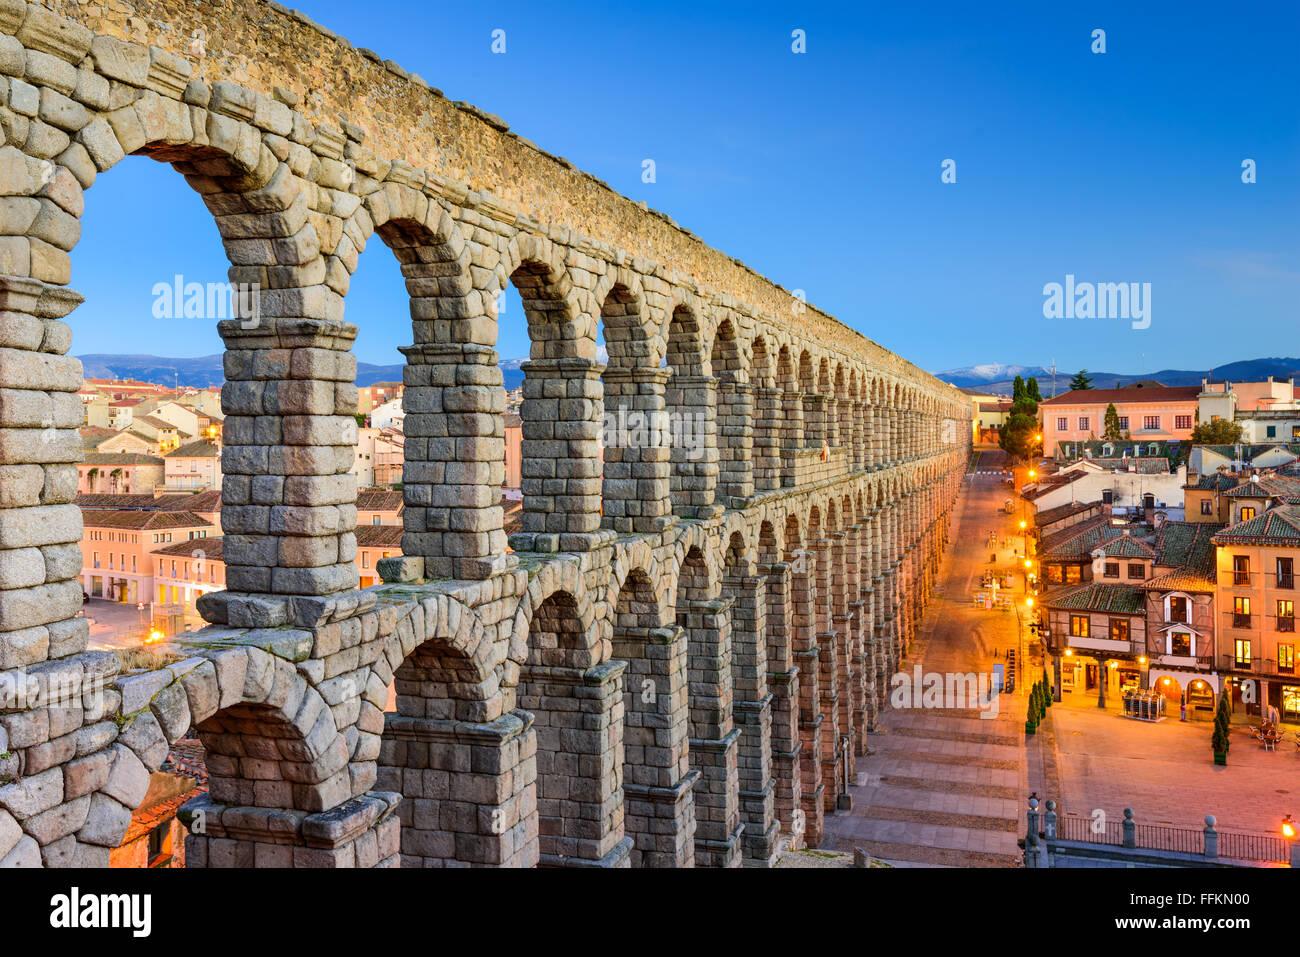 Segovia, Spain town view at Plaza del Azoguejo and the ancient Roman aqueduct. - Stock Image